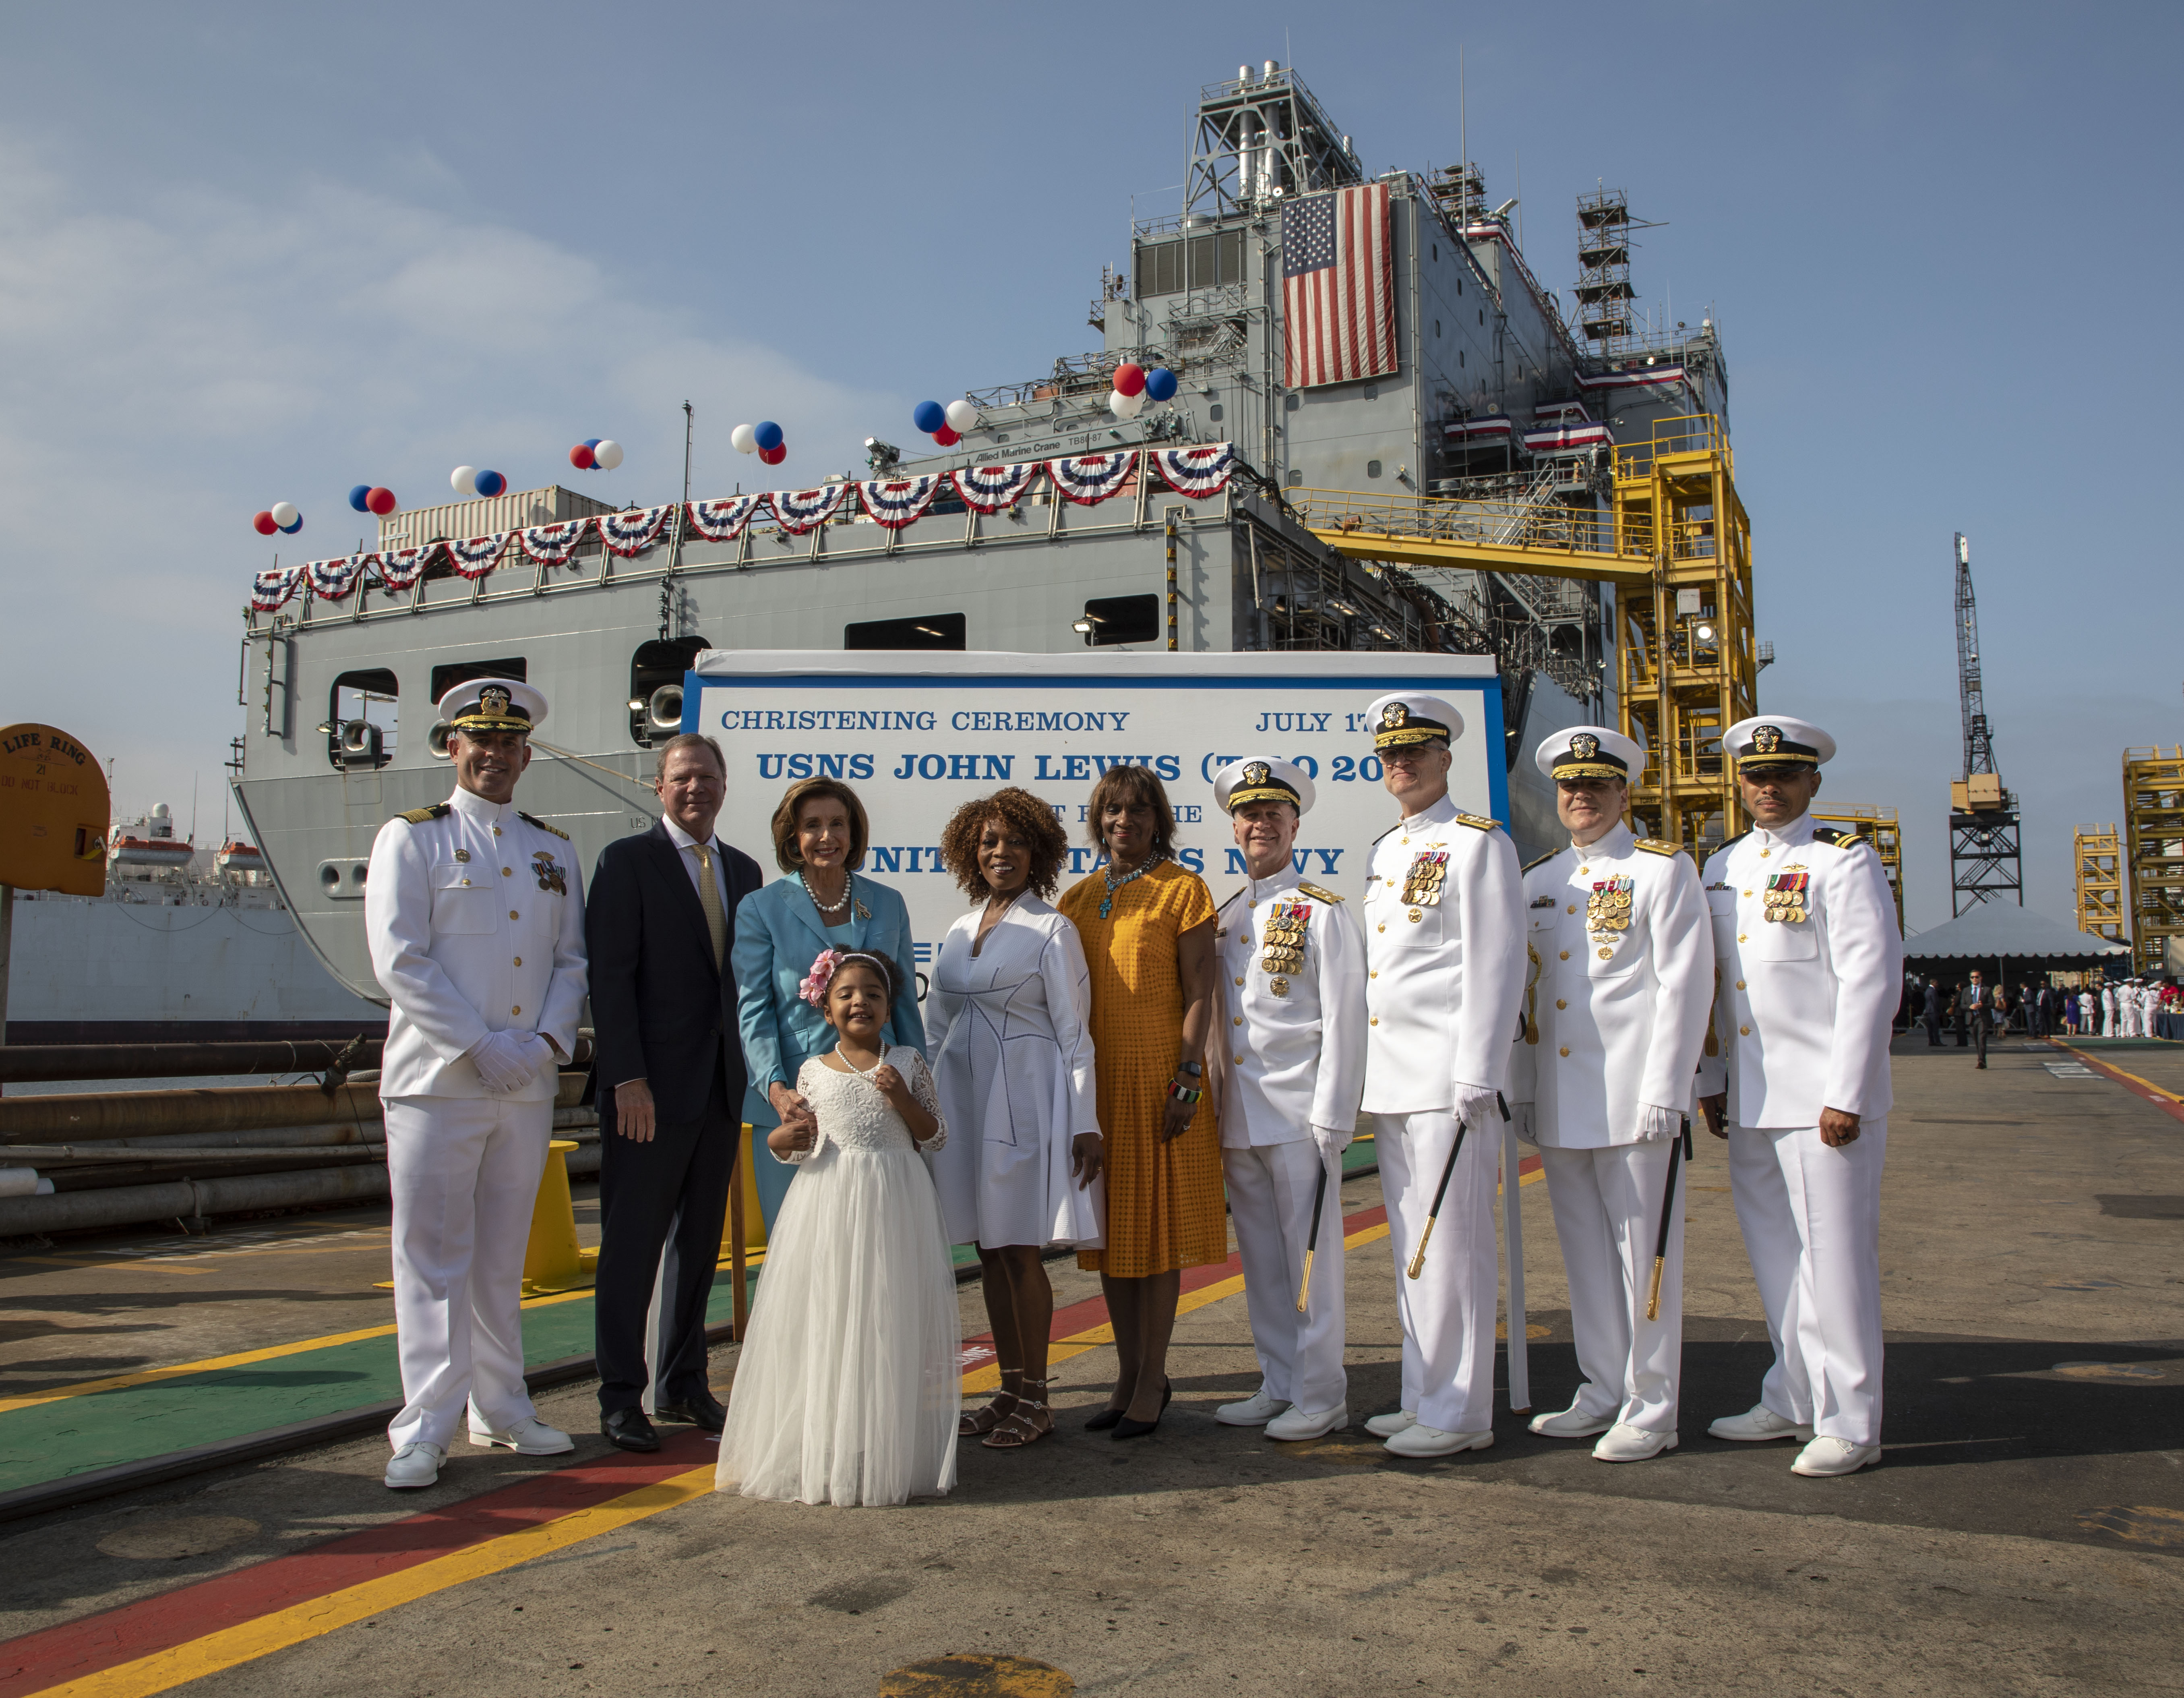 07-17-21-T-AO-Hull-571_Christening-Ceremony_Cam1_15